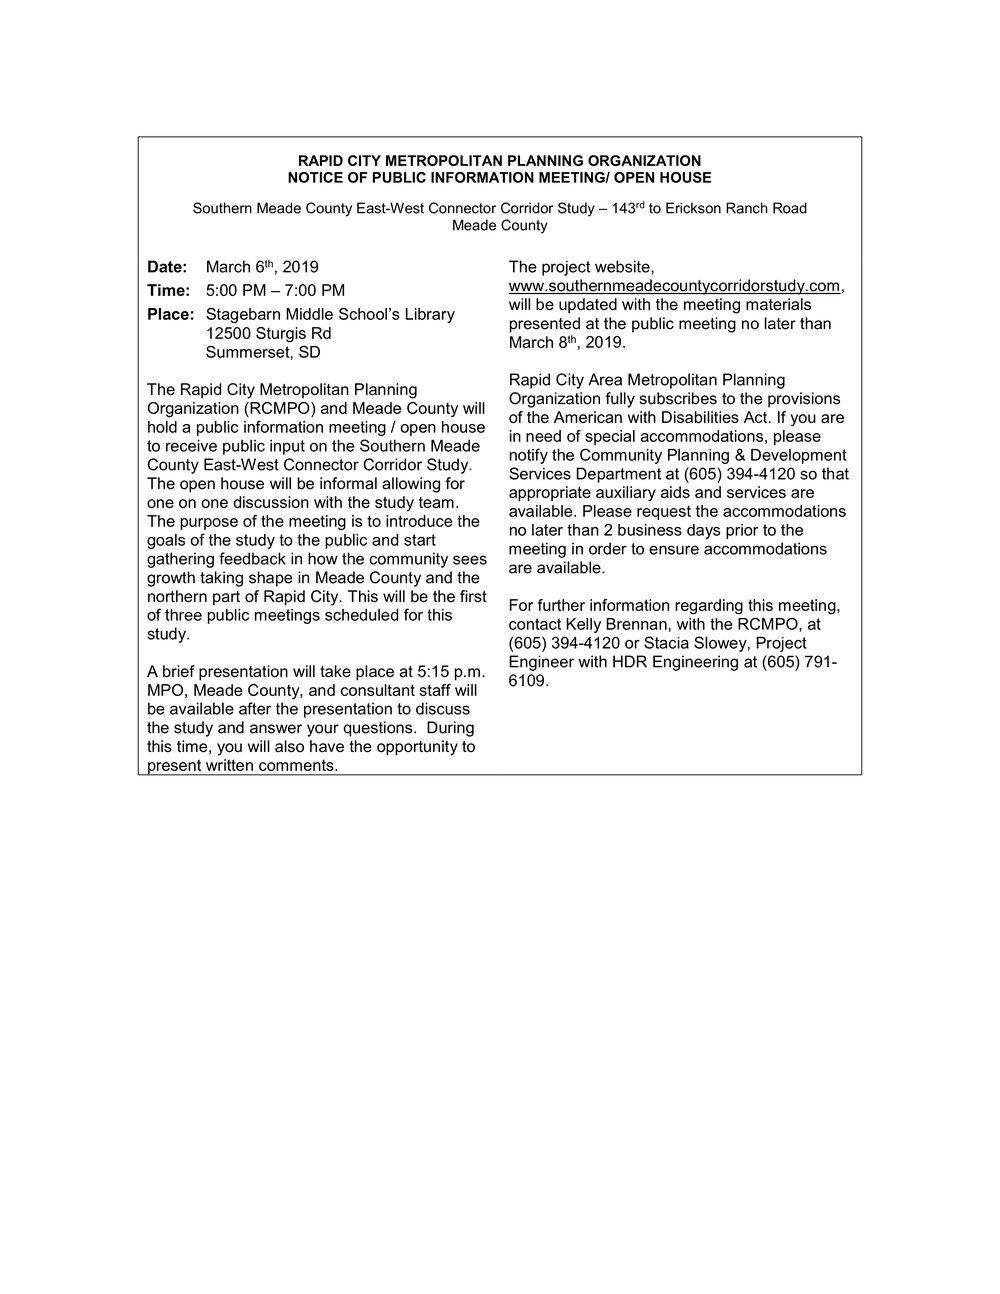 MeadeCoCorridorStudy_Public Meeting Notice .jpg